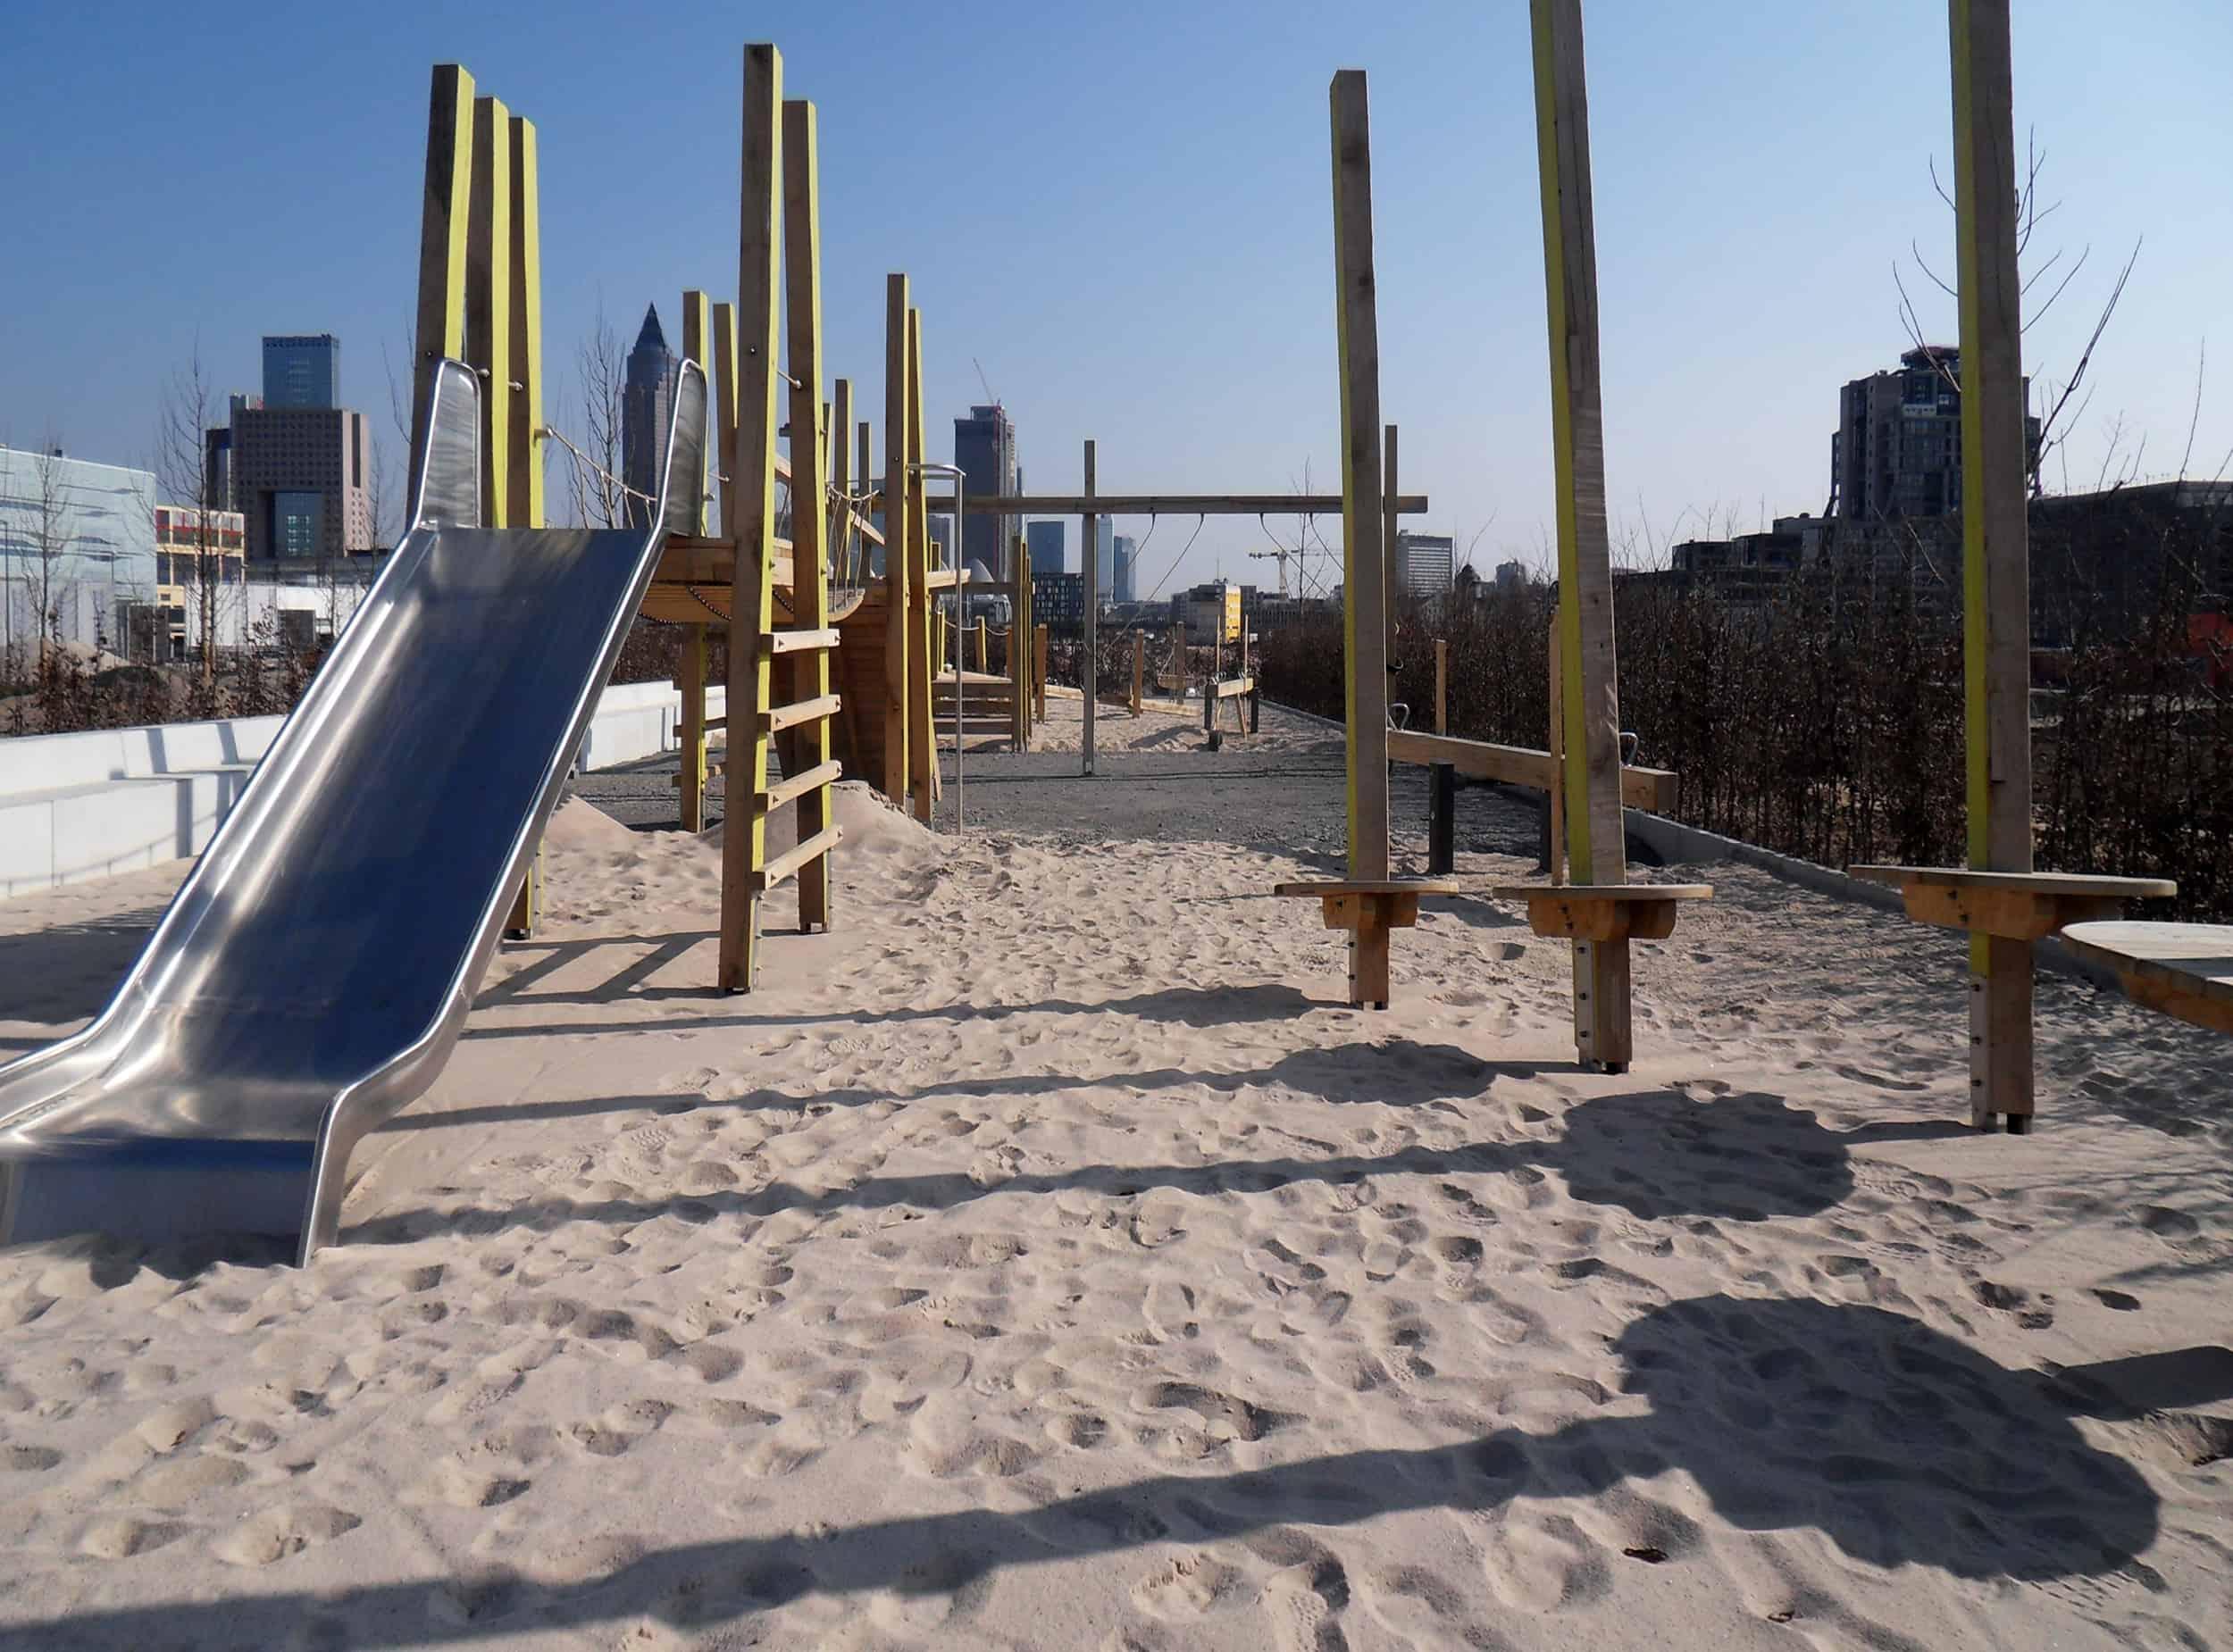 DAM - Playground Project